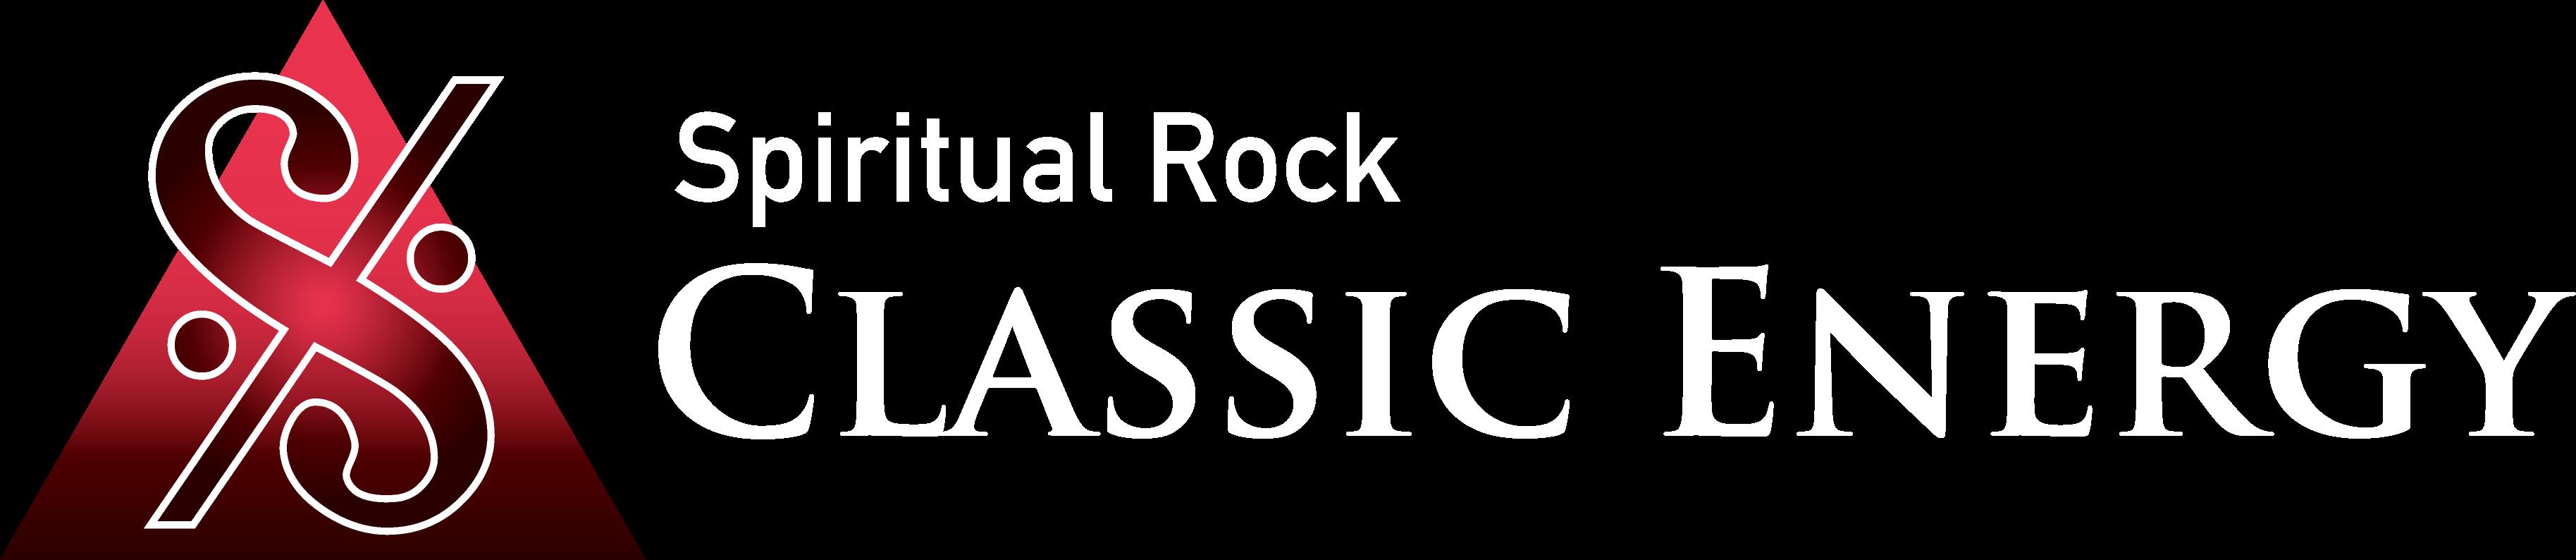 Classic Energy [クラシック・エナジー]